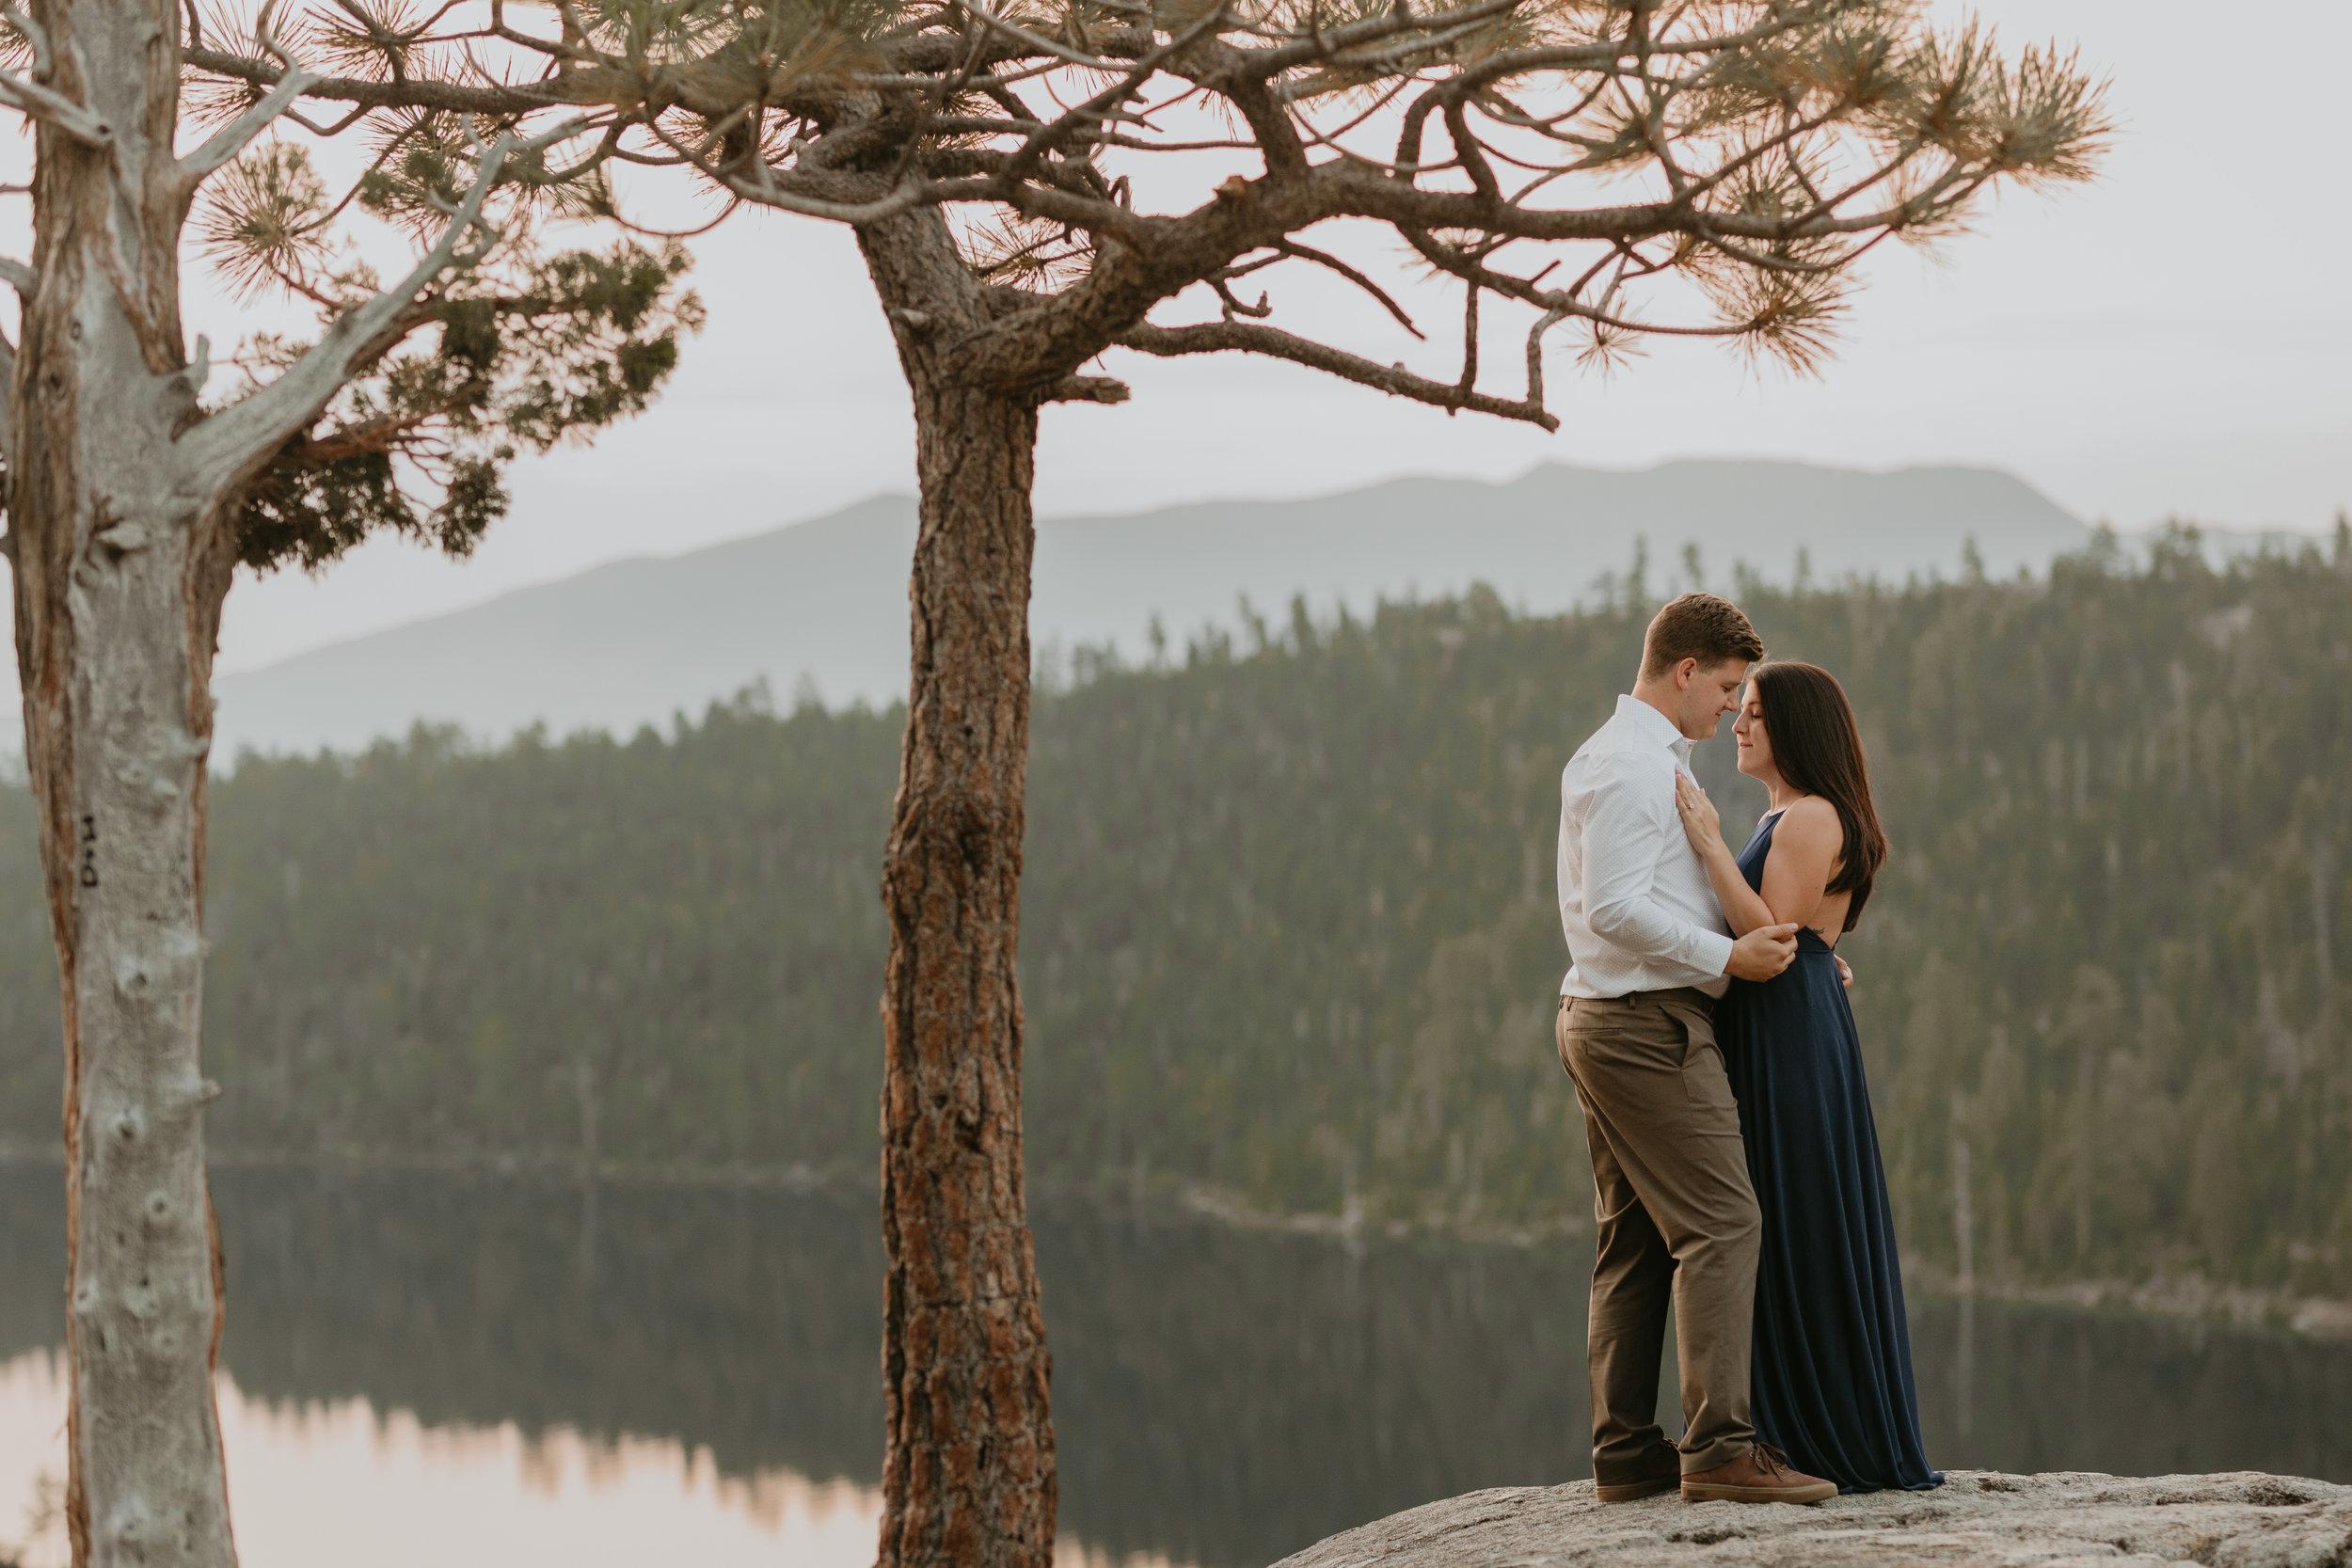 nicole-daacke-photography-lake-tahoe-sunrise-summer-adventure-engagement-photos-nevada-wedding-elopement-photographer-golden-emerald-bay-light-pine-trees-summer-vibe-fun-carefree-authentic-love-7.jpg